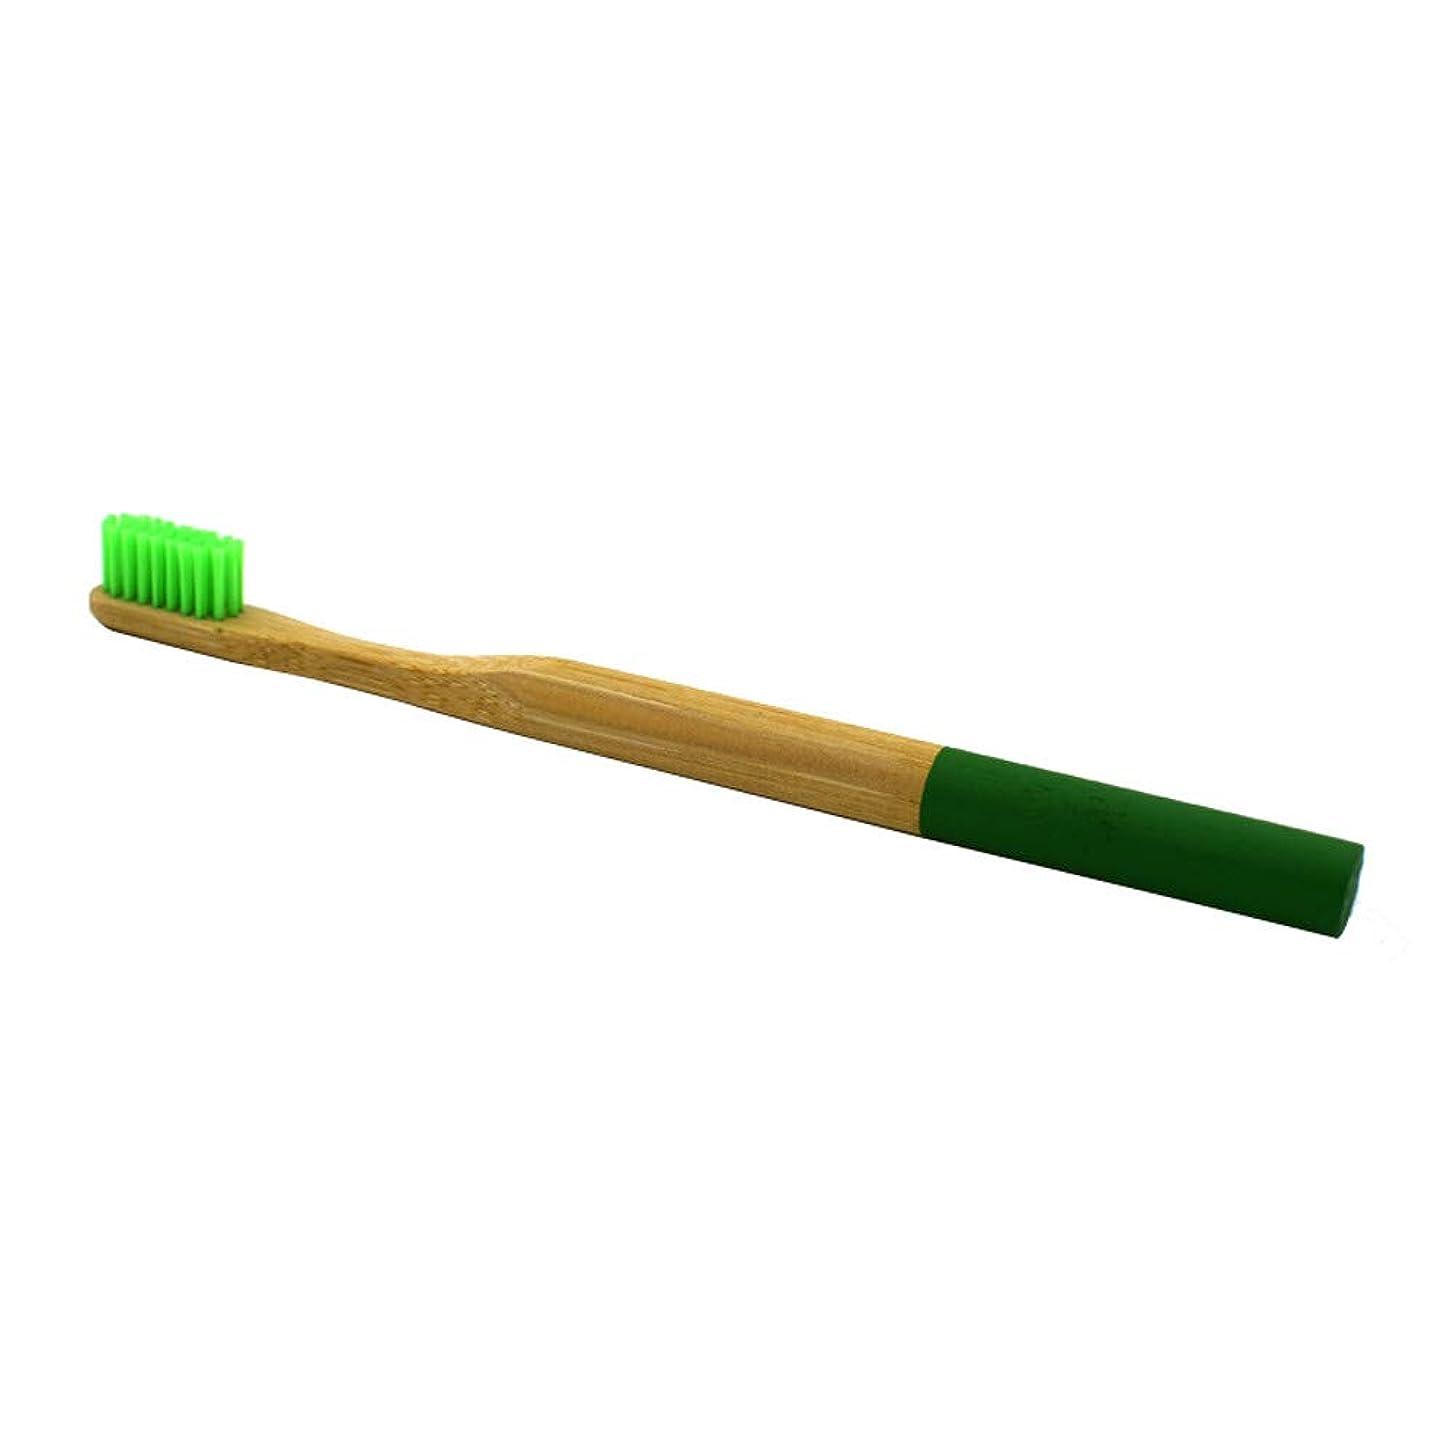 Hoshell Bamboo Natural Toothbrush Eco-Friendly Natural Adult Medium Biodegradable Toothbrush (Green)